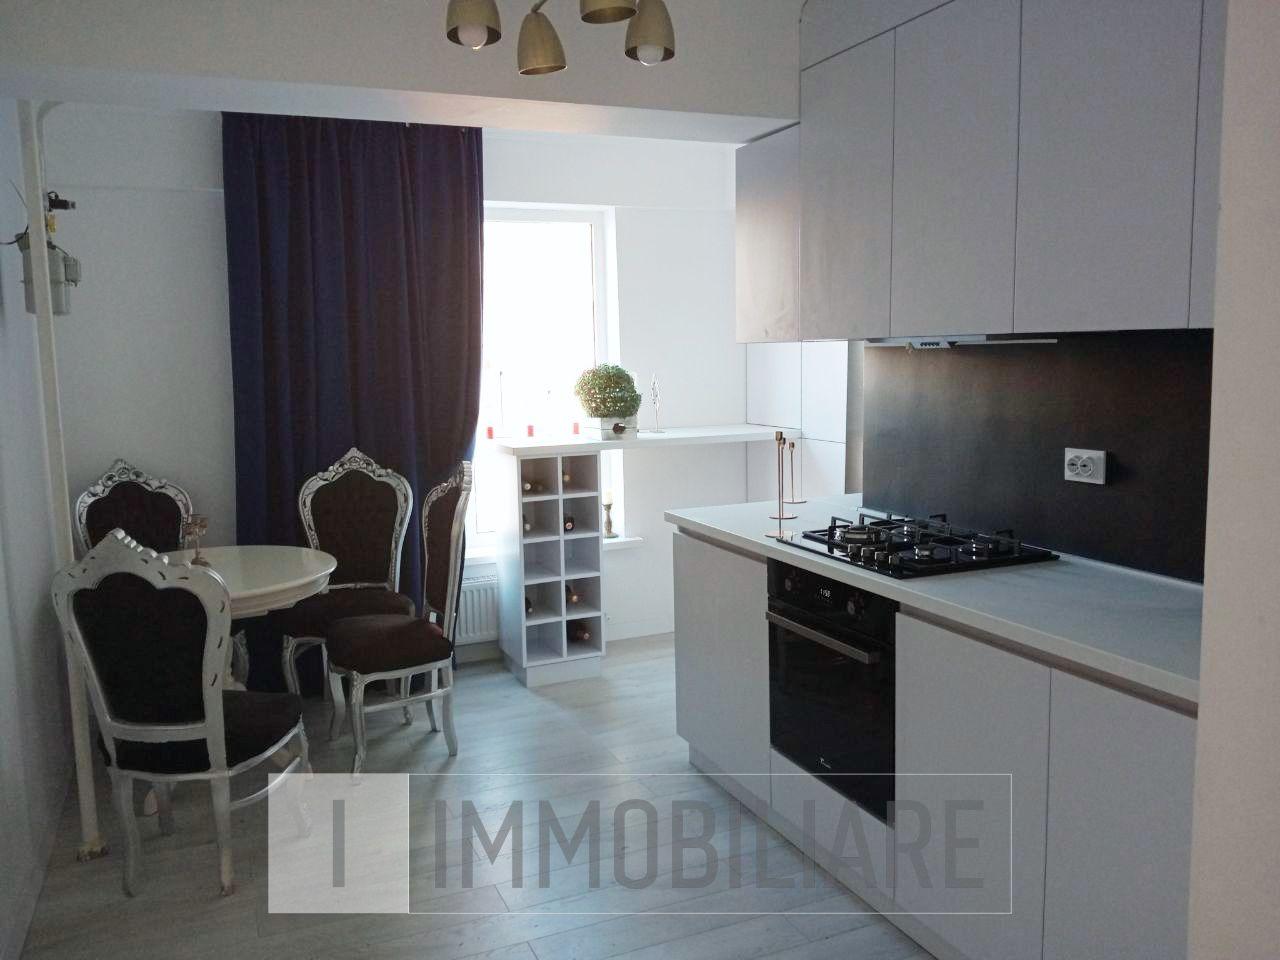 Apartament cu 2 camere+living, sect. Centru, str. Testemițanu.